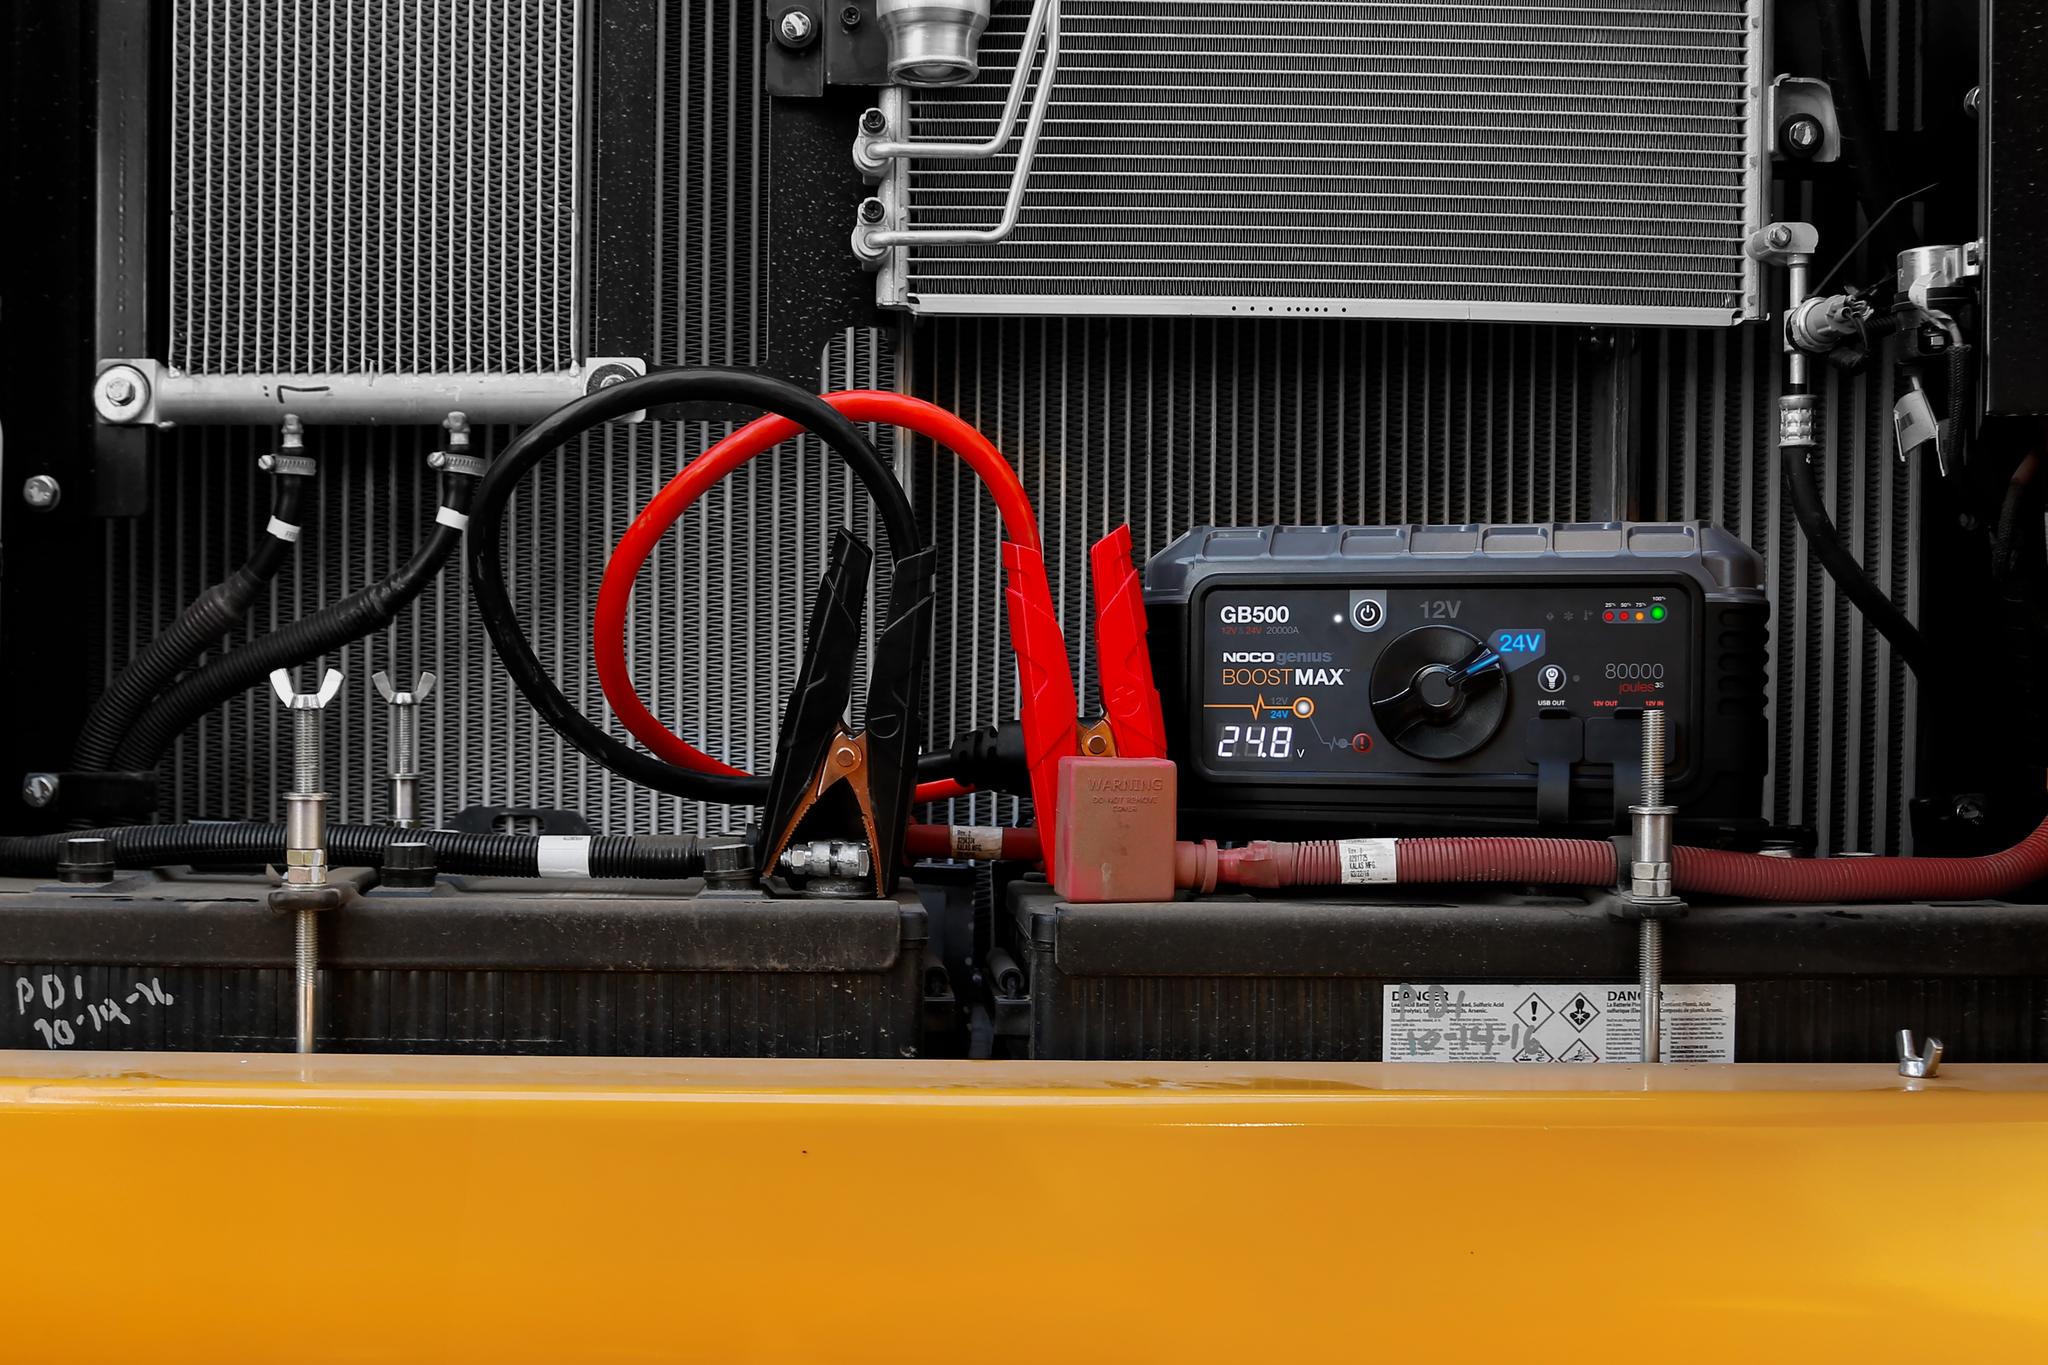 Пусковое устройство Noco GB500 Boost Max